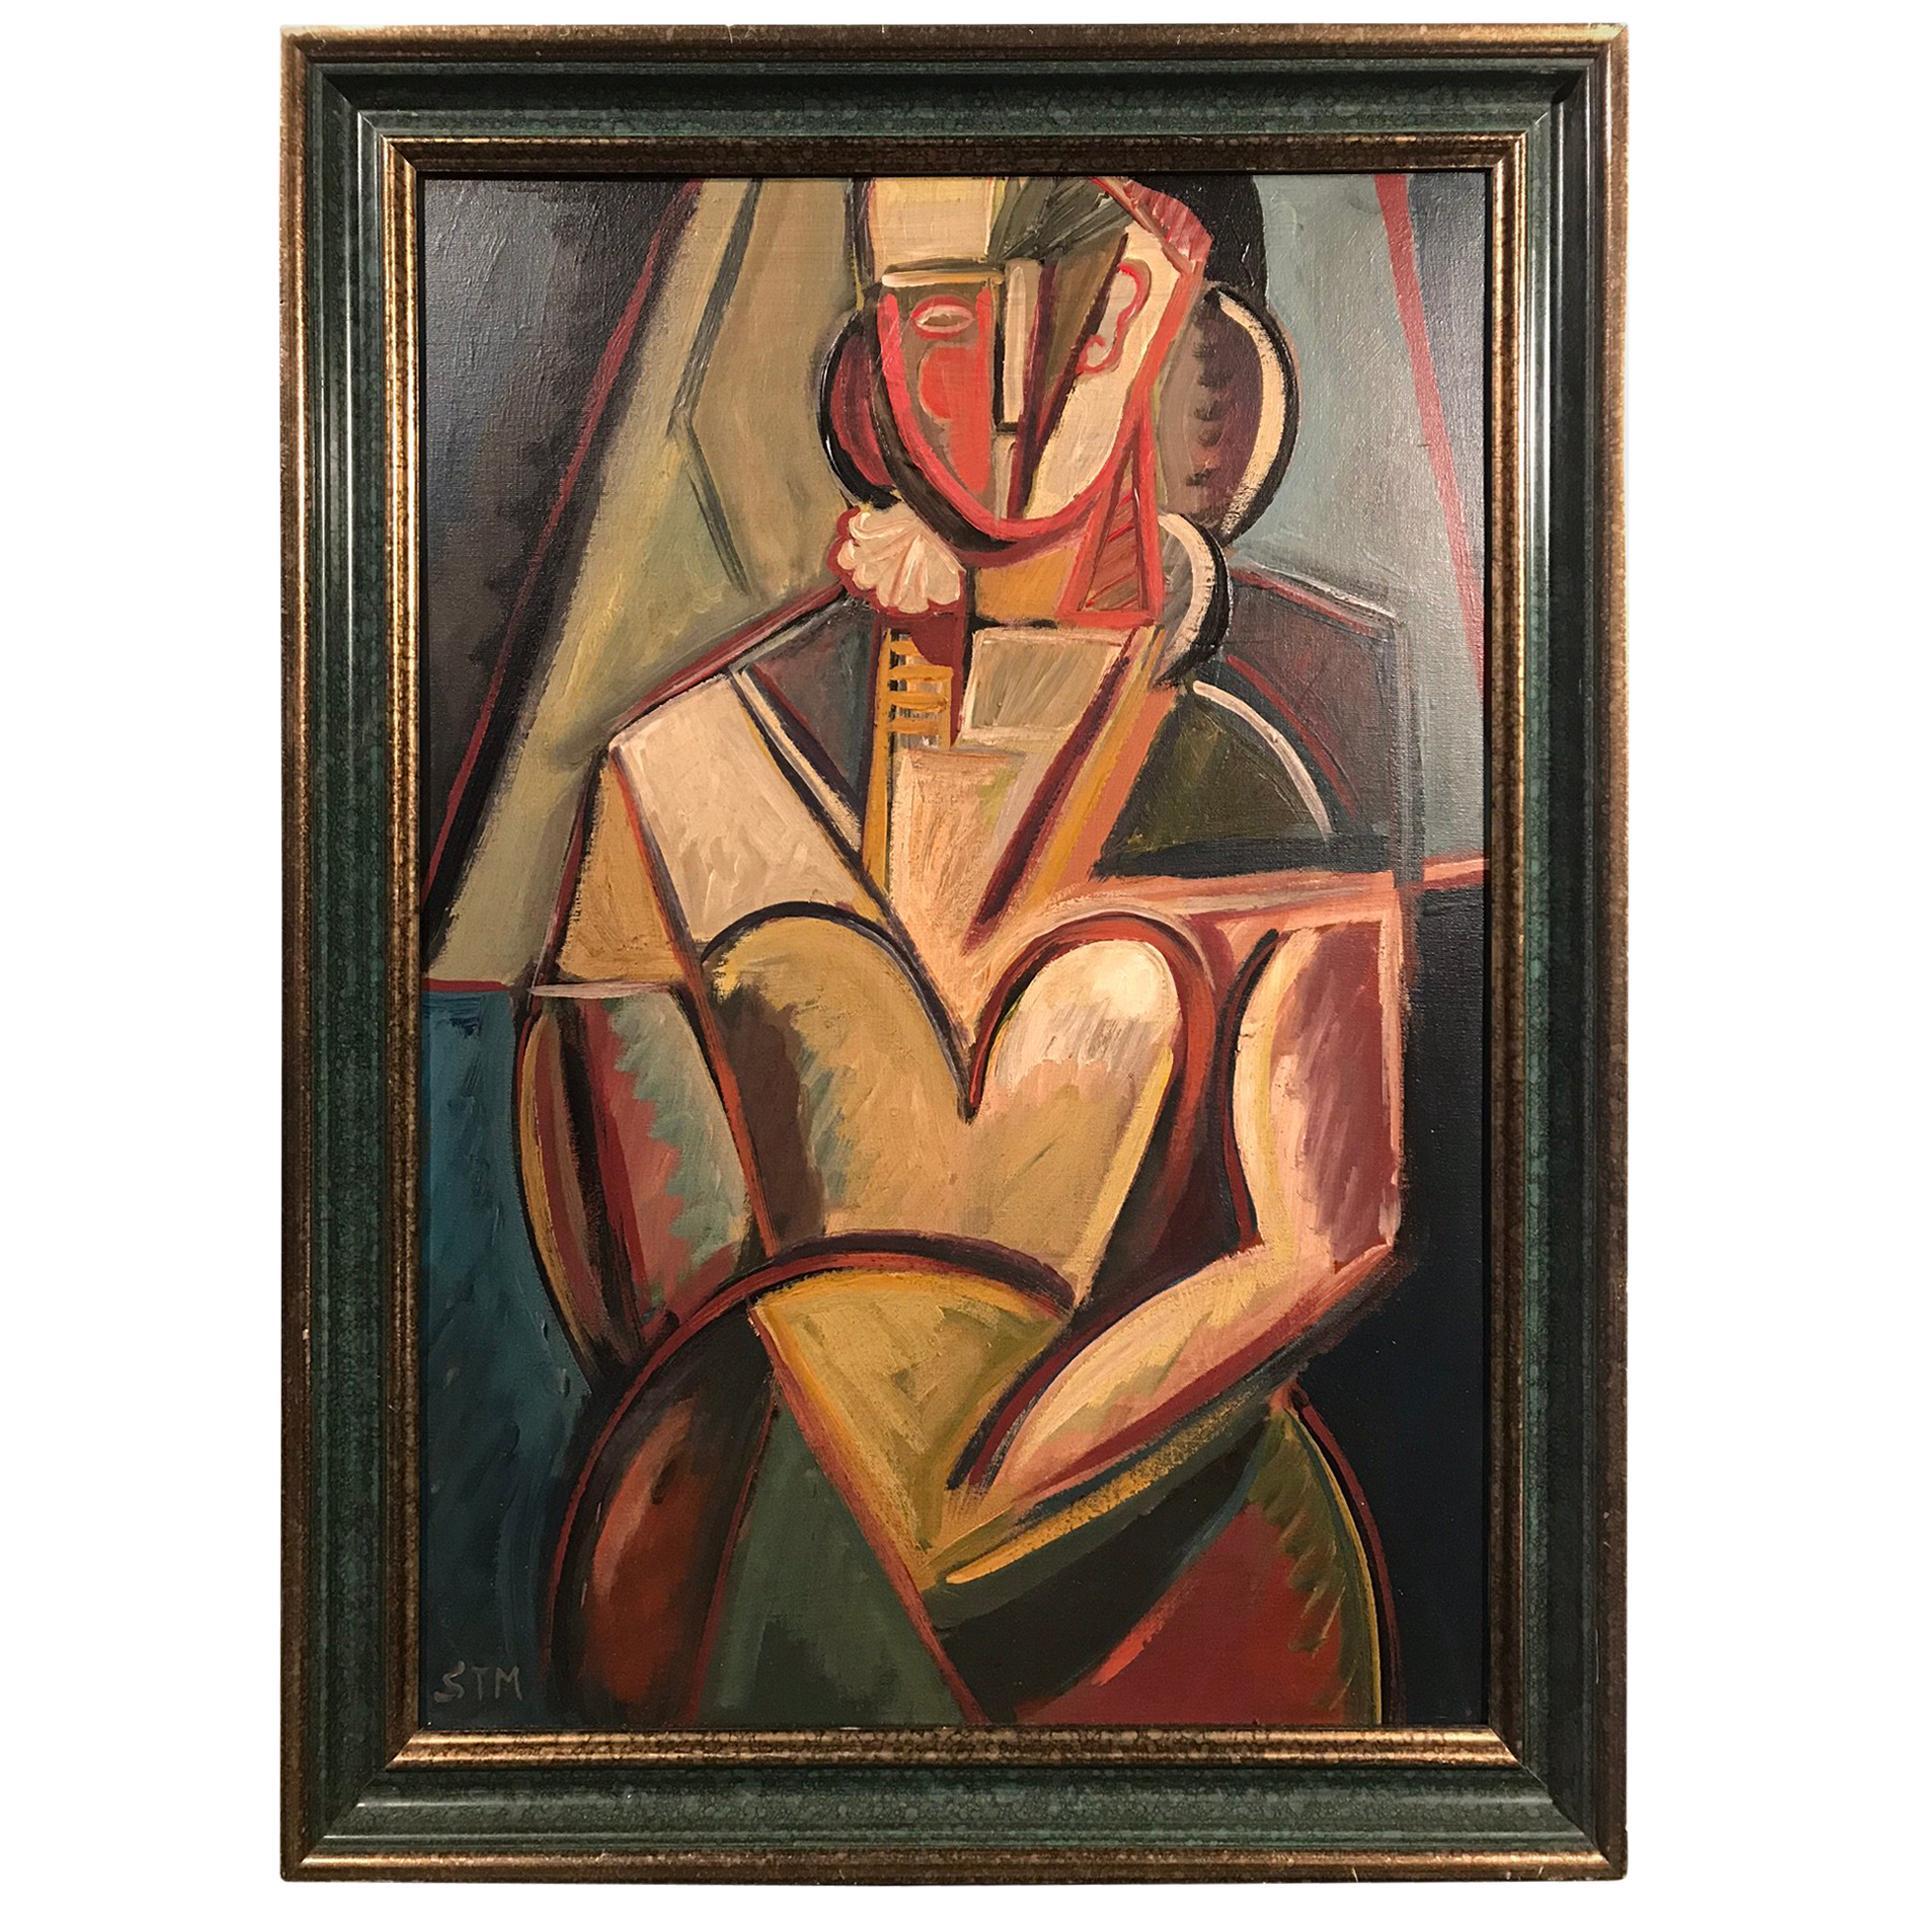 STM Signed Portrait of a Woman Cubist Painting